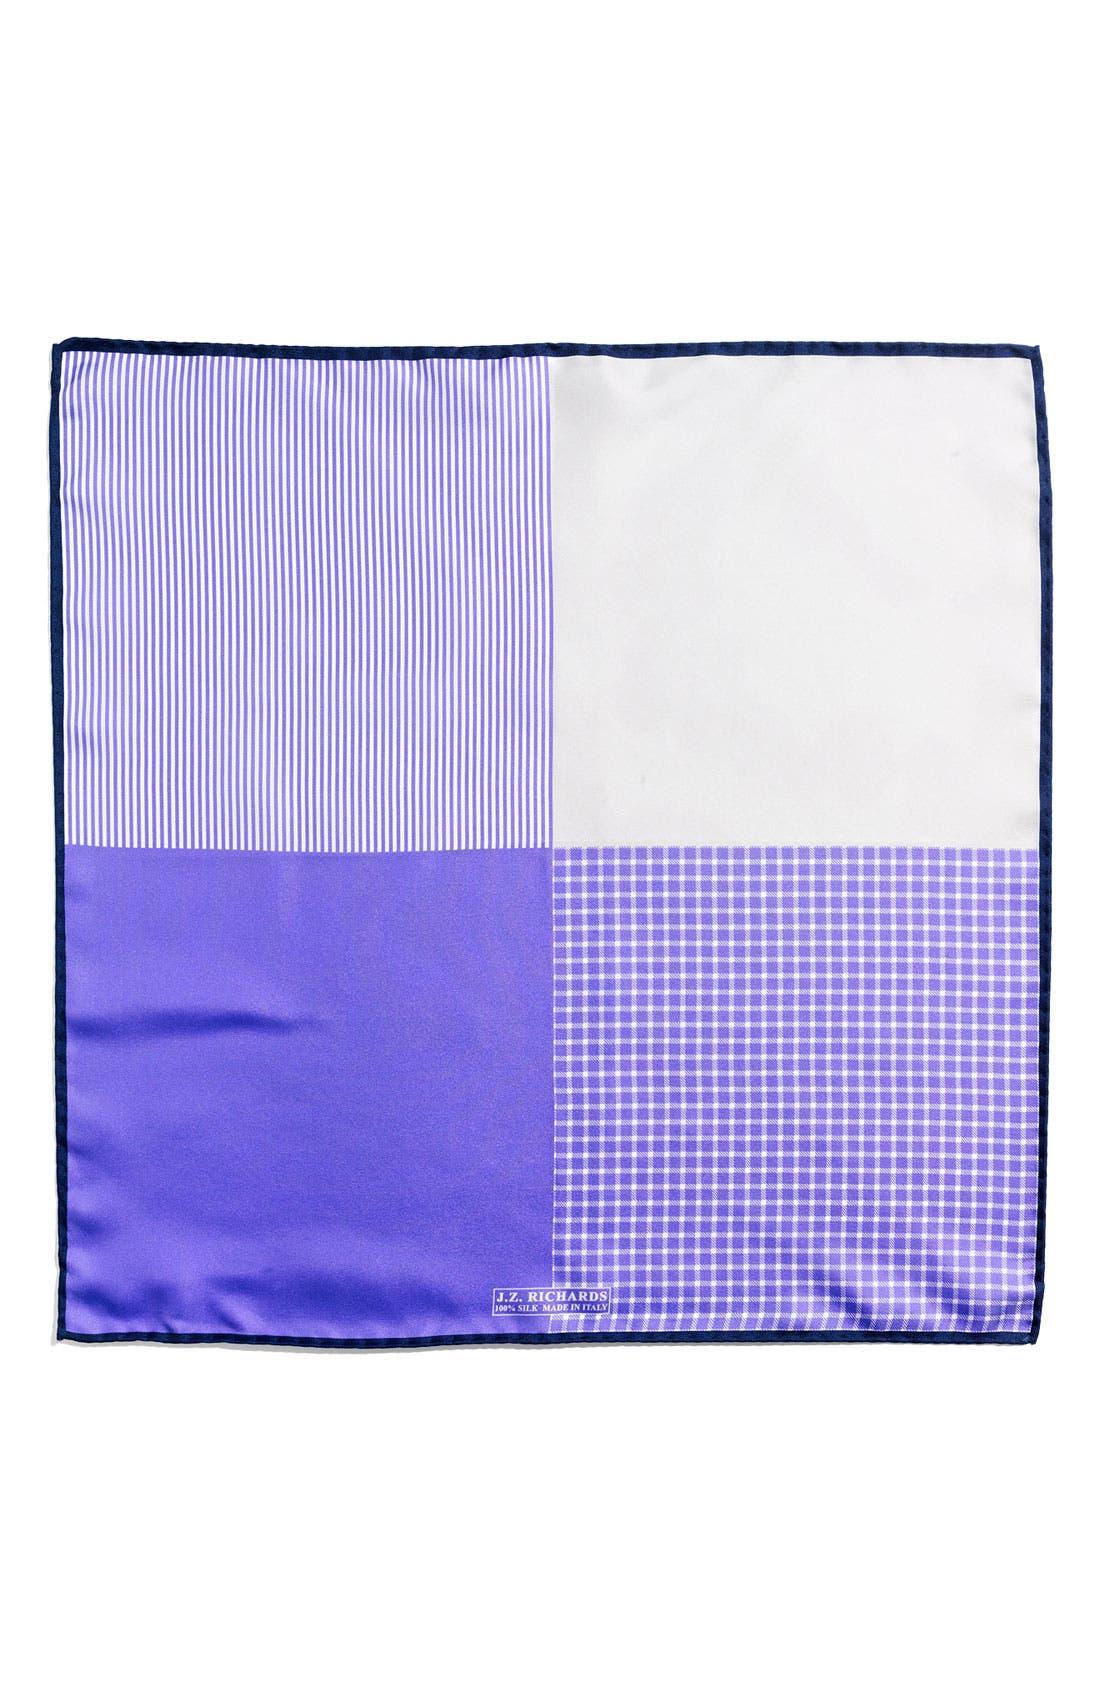 Main Image - J.Z. Richards Silk Pocket Square